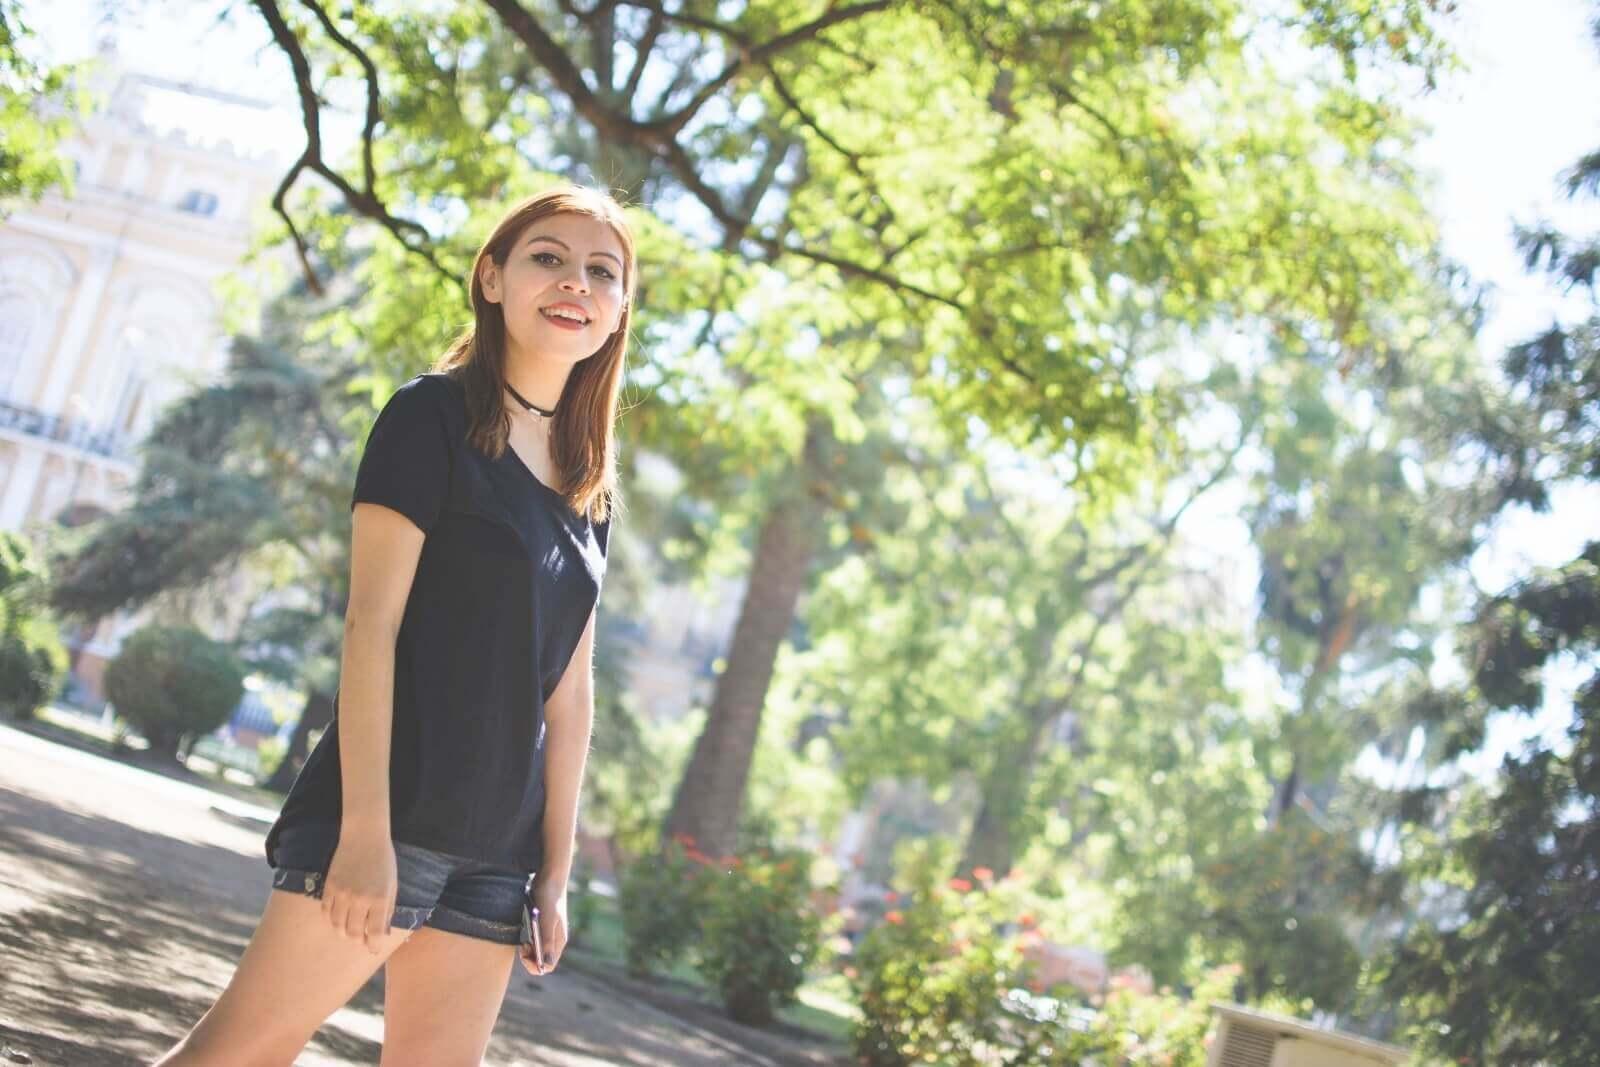 black-tshirt-jeans-california-girl-outfit-ankle-booties-summer-in-black-deborah-ferrero-style-by-deb08